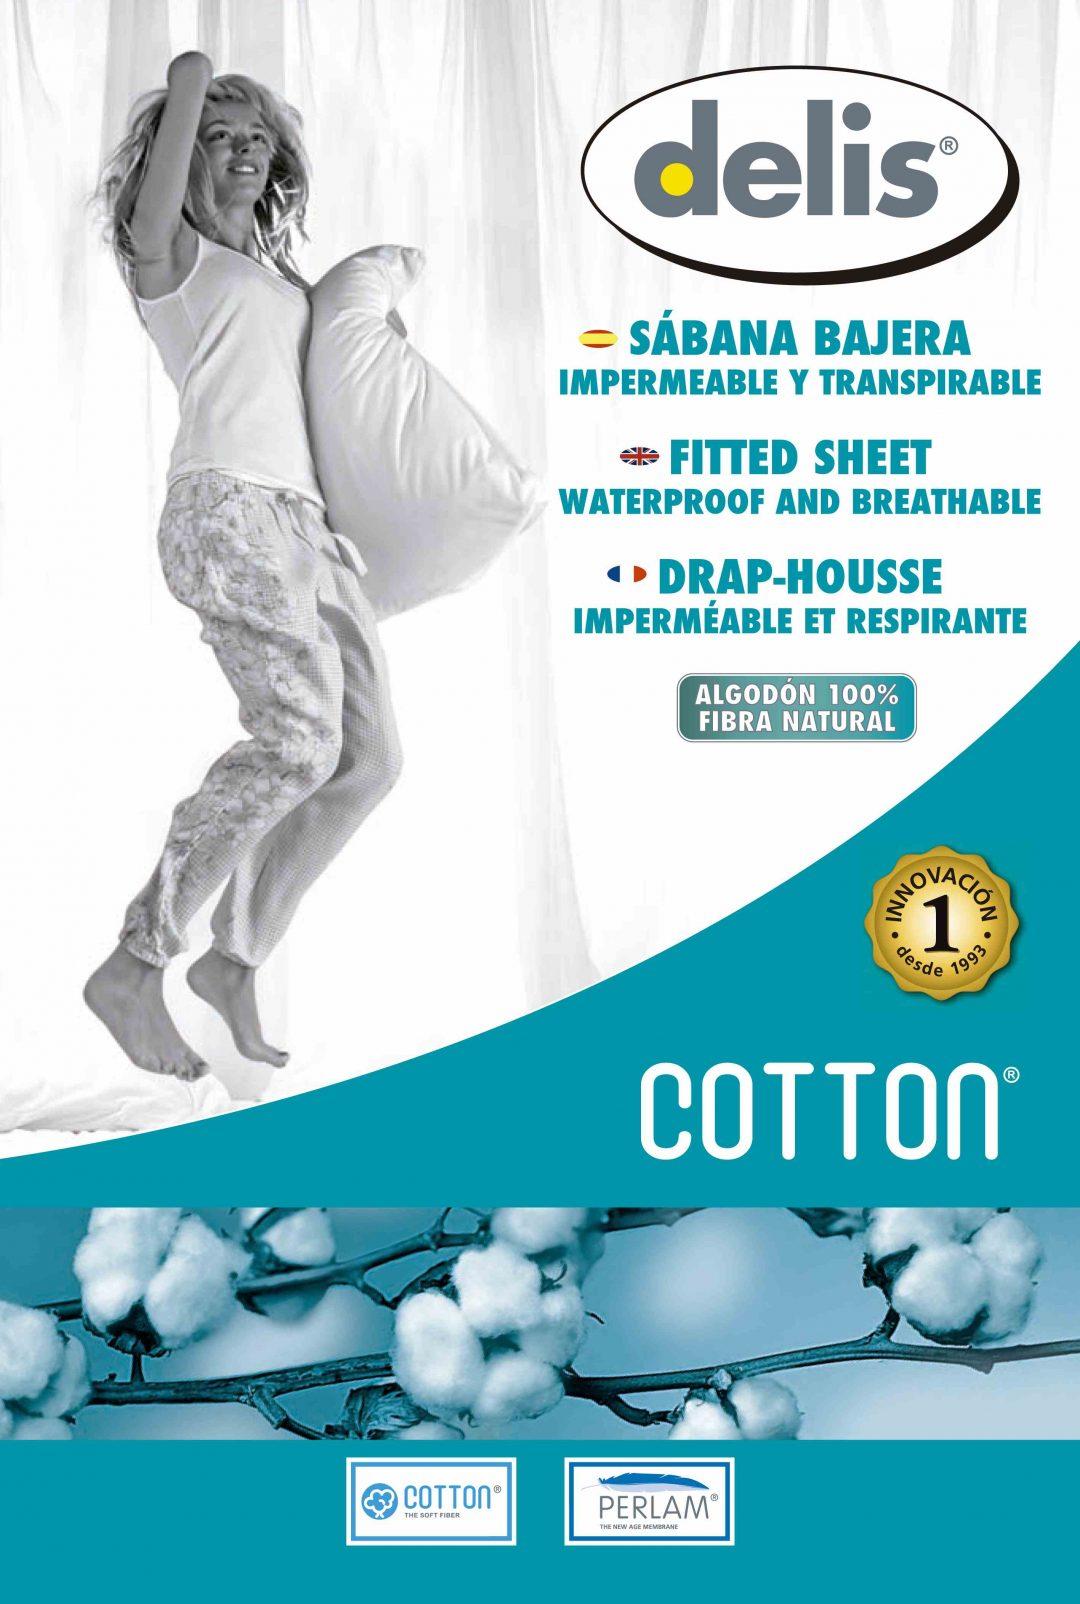 Sabana bajera COTTON – Delisproducts